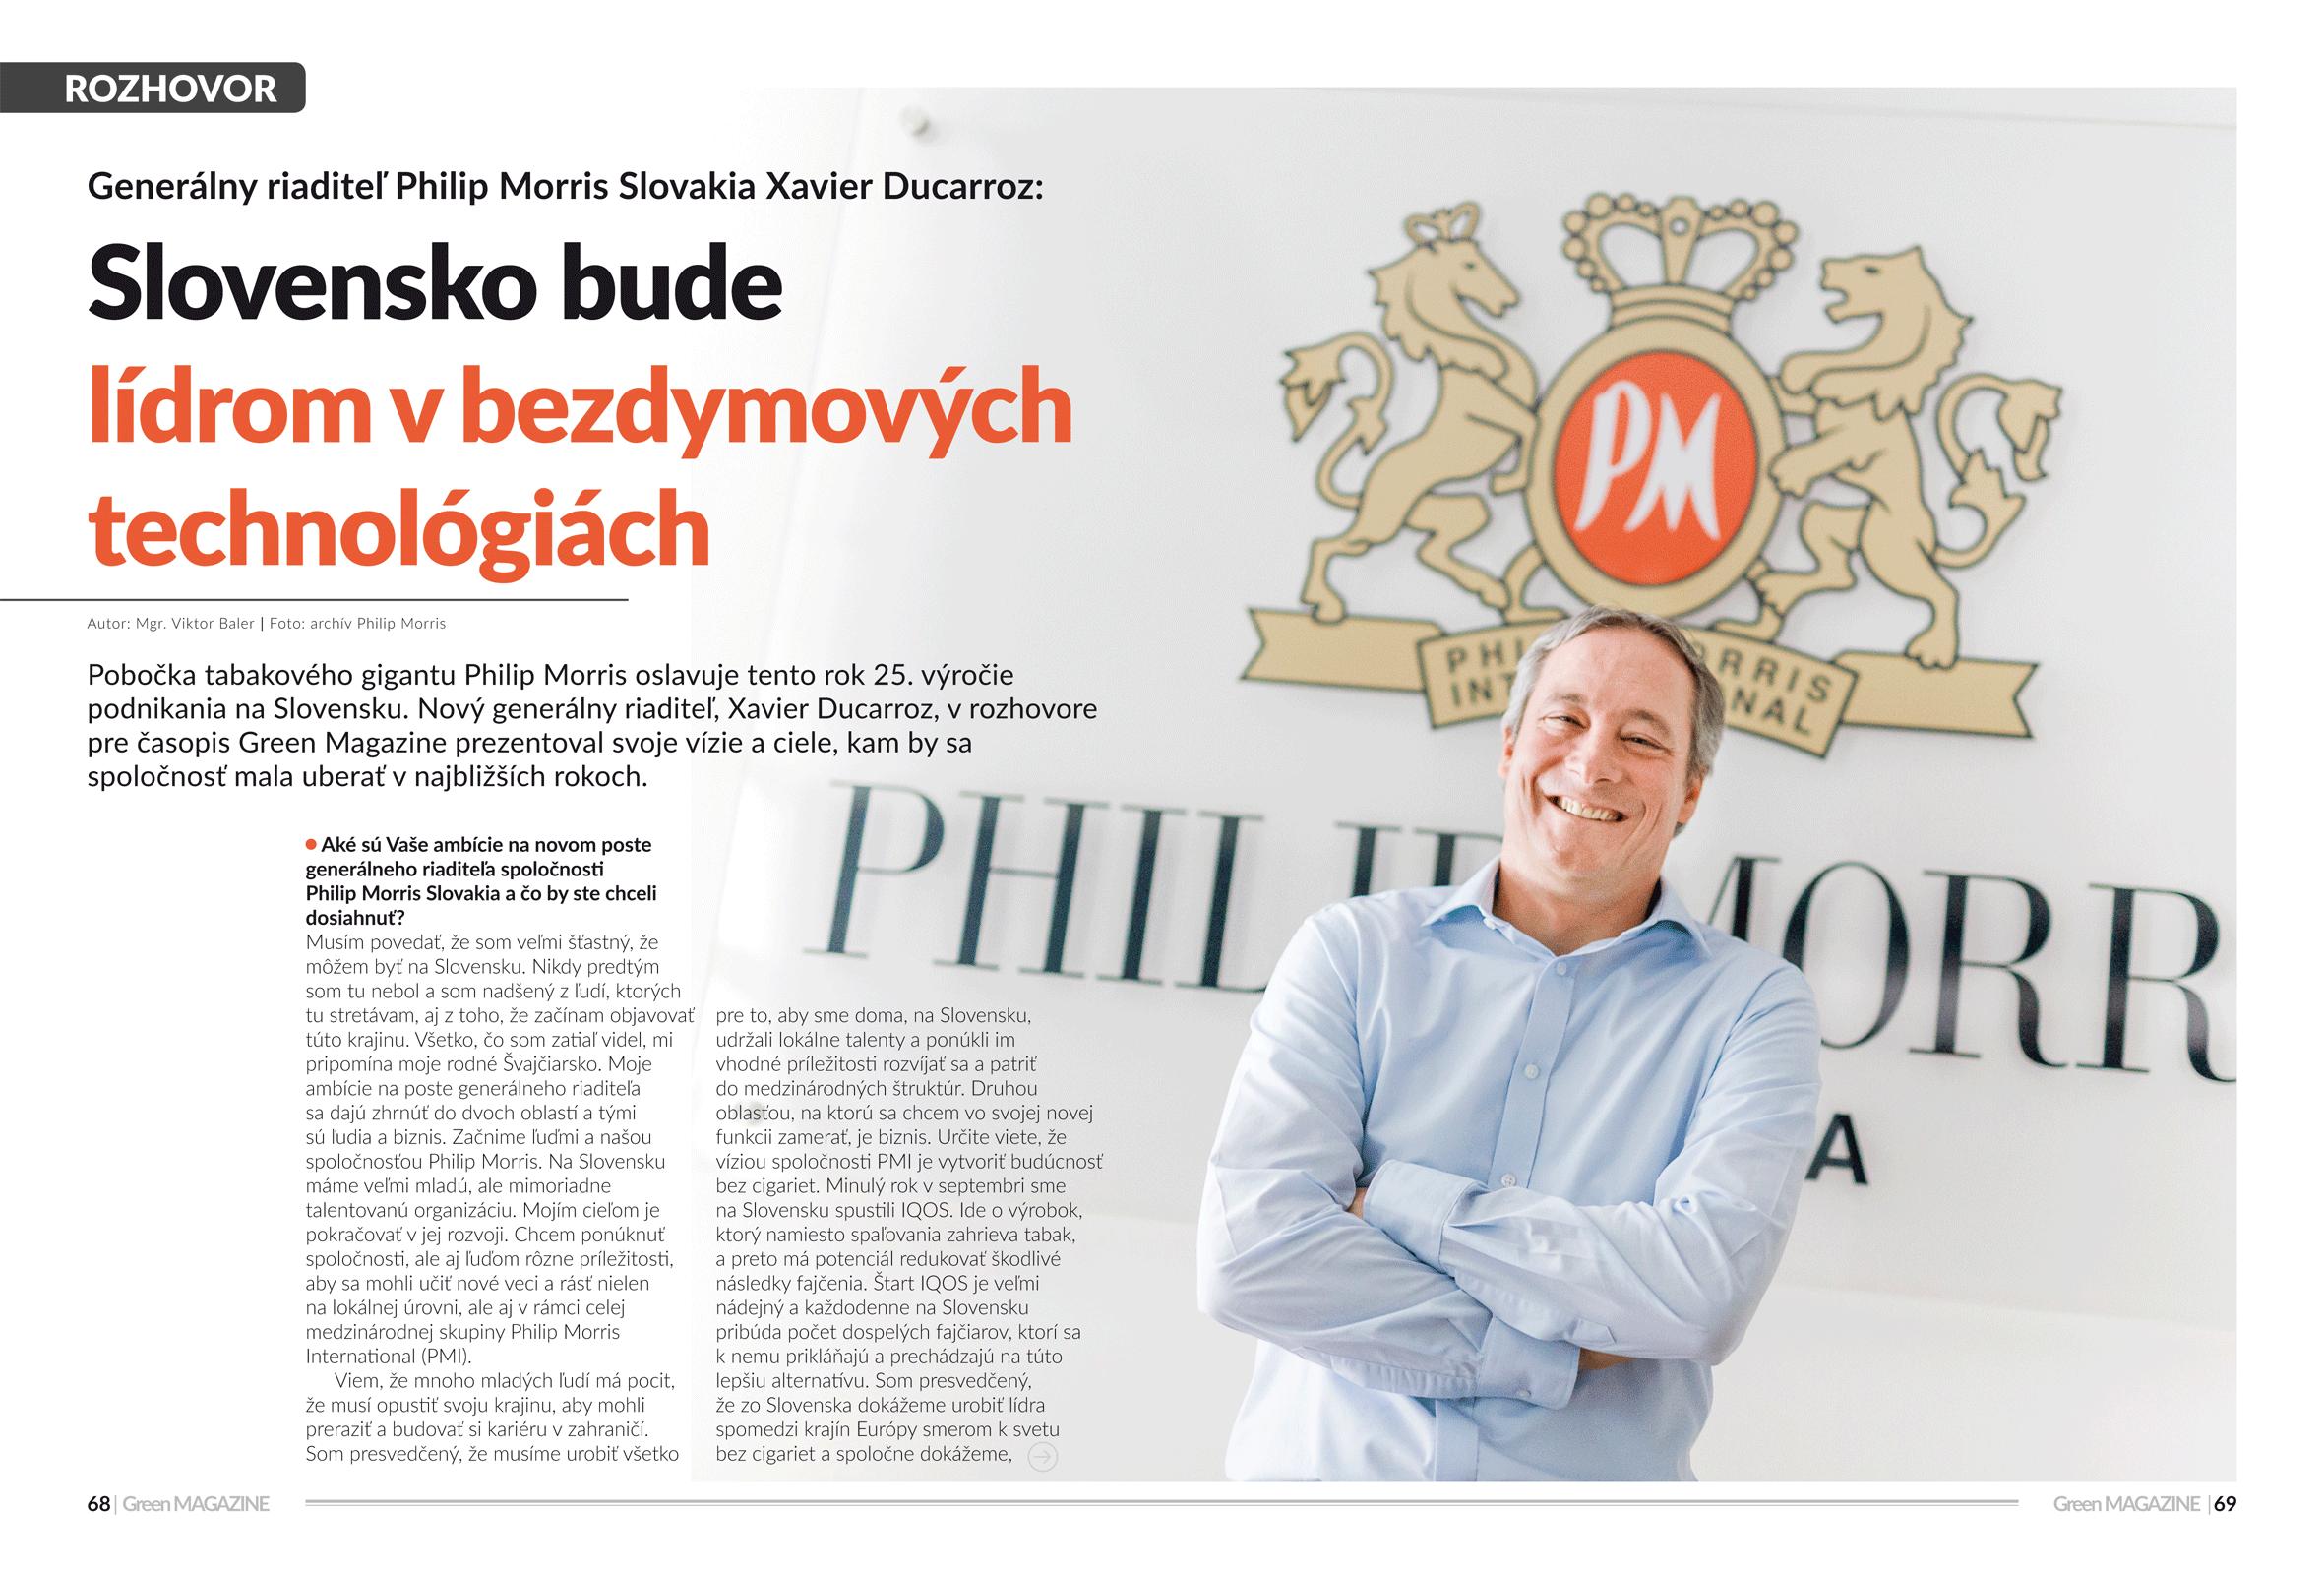 Xavier Ducarroz, Philip Morris Slovakia